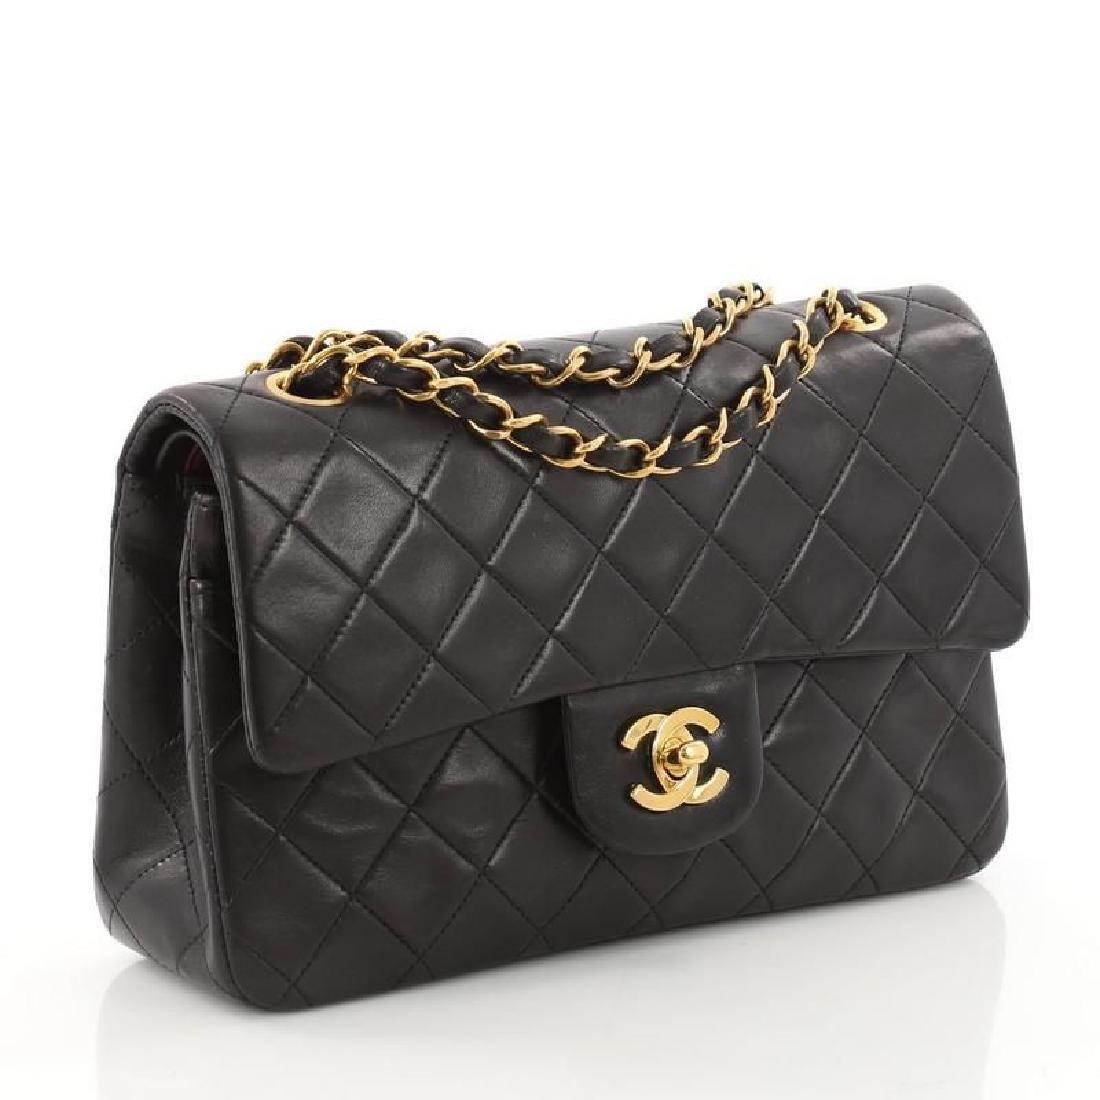 Chanel Double Flap Classic Shoulder Bag Black Lambskin